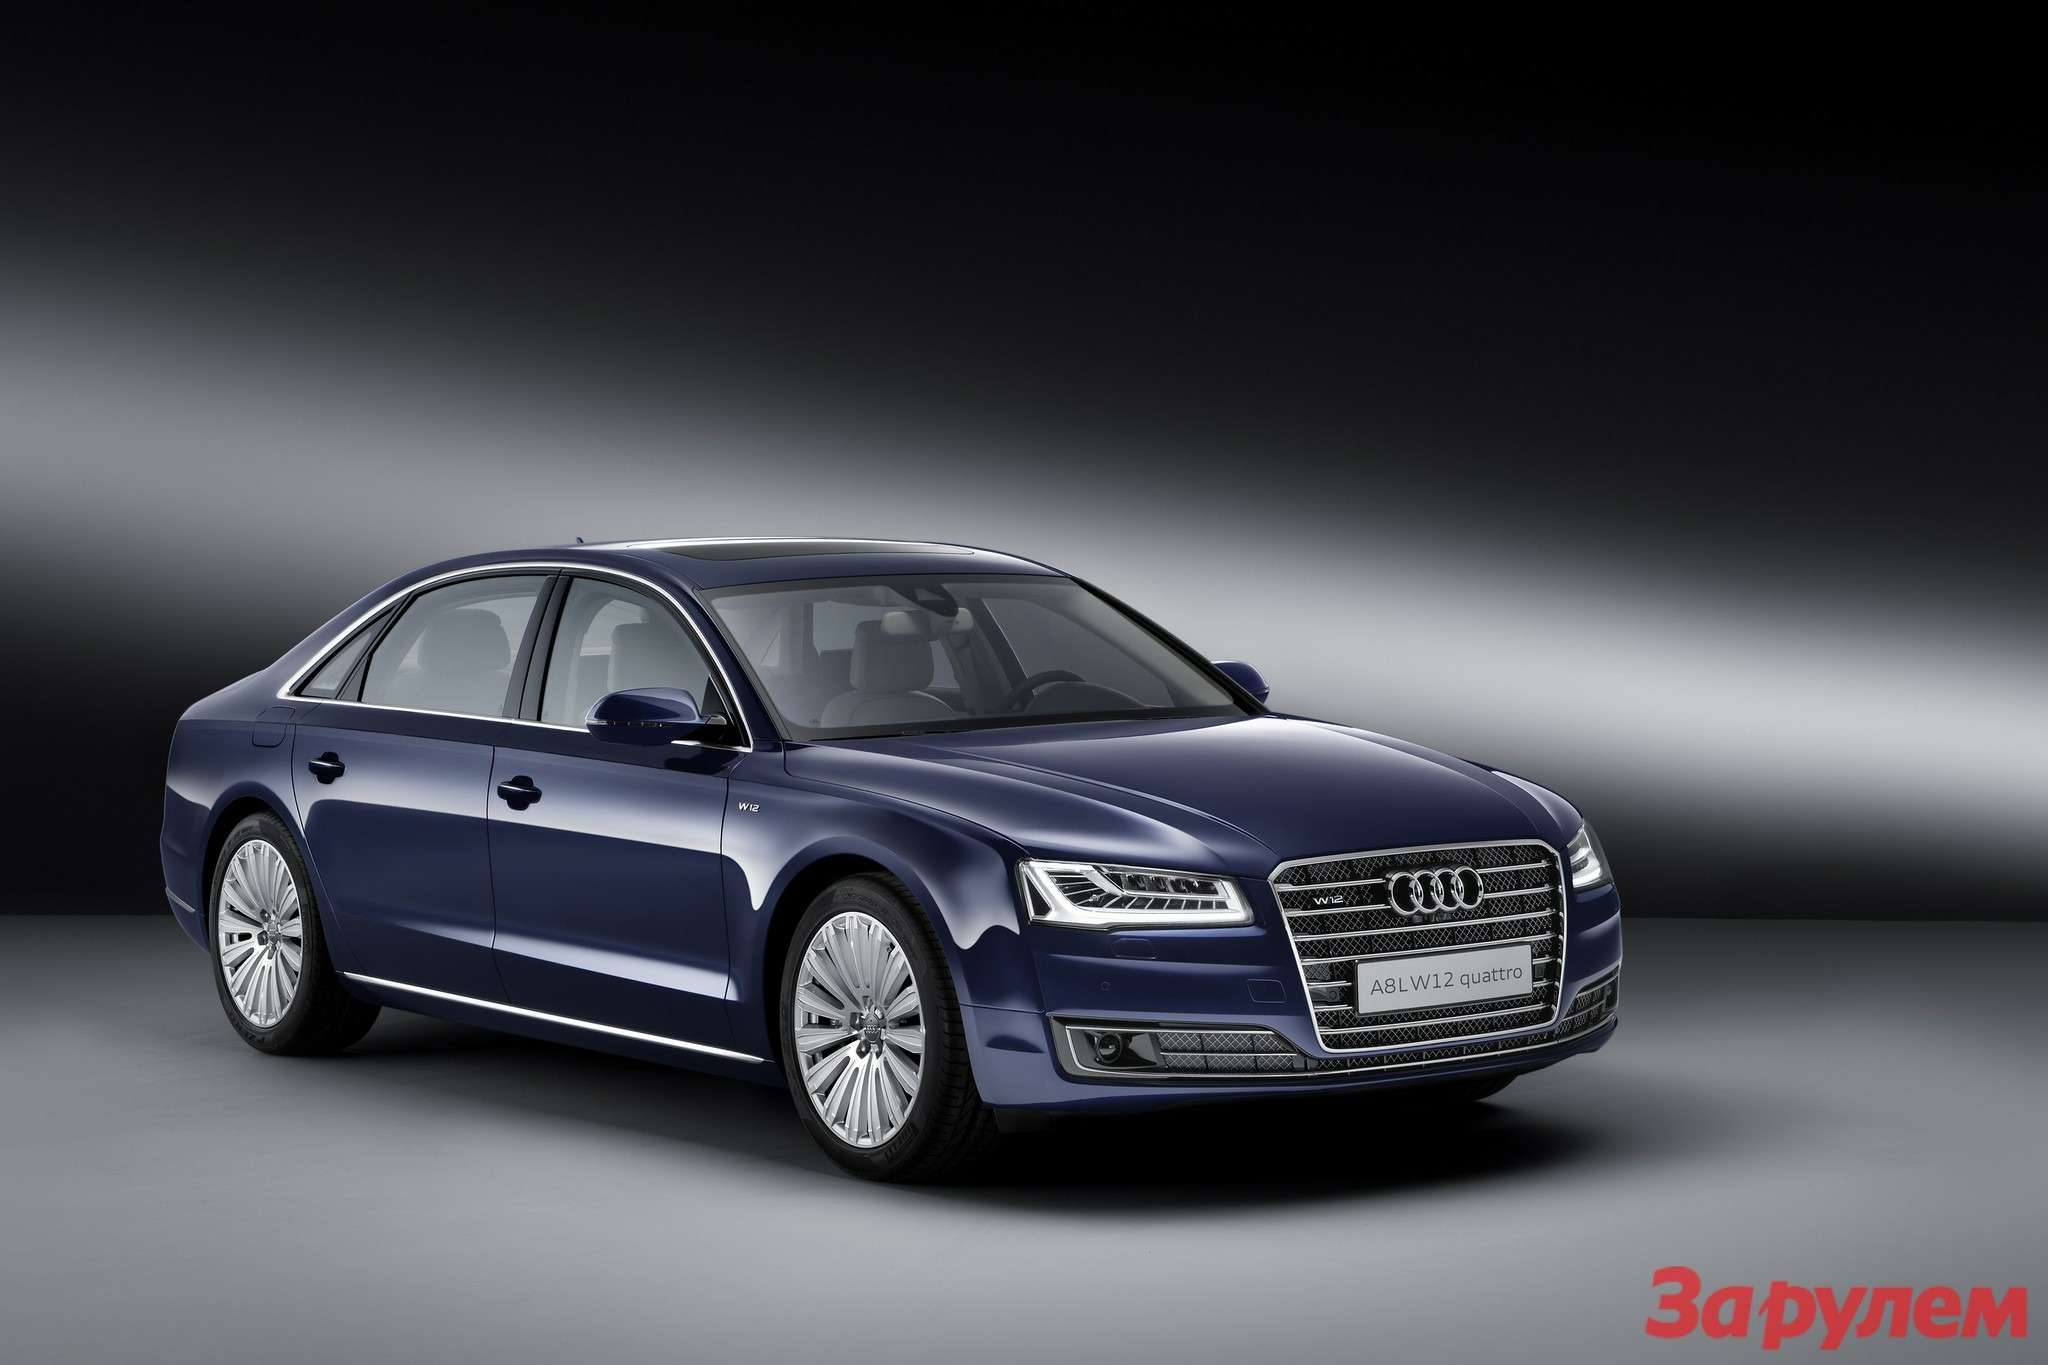 Audi A8L W12 exclusive